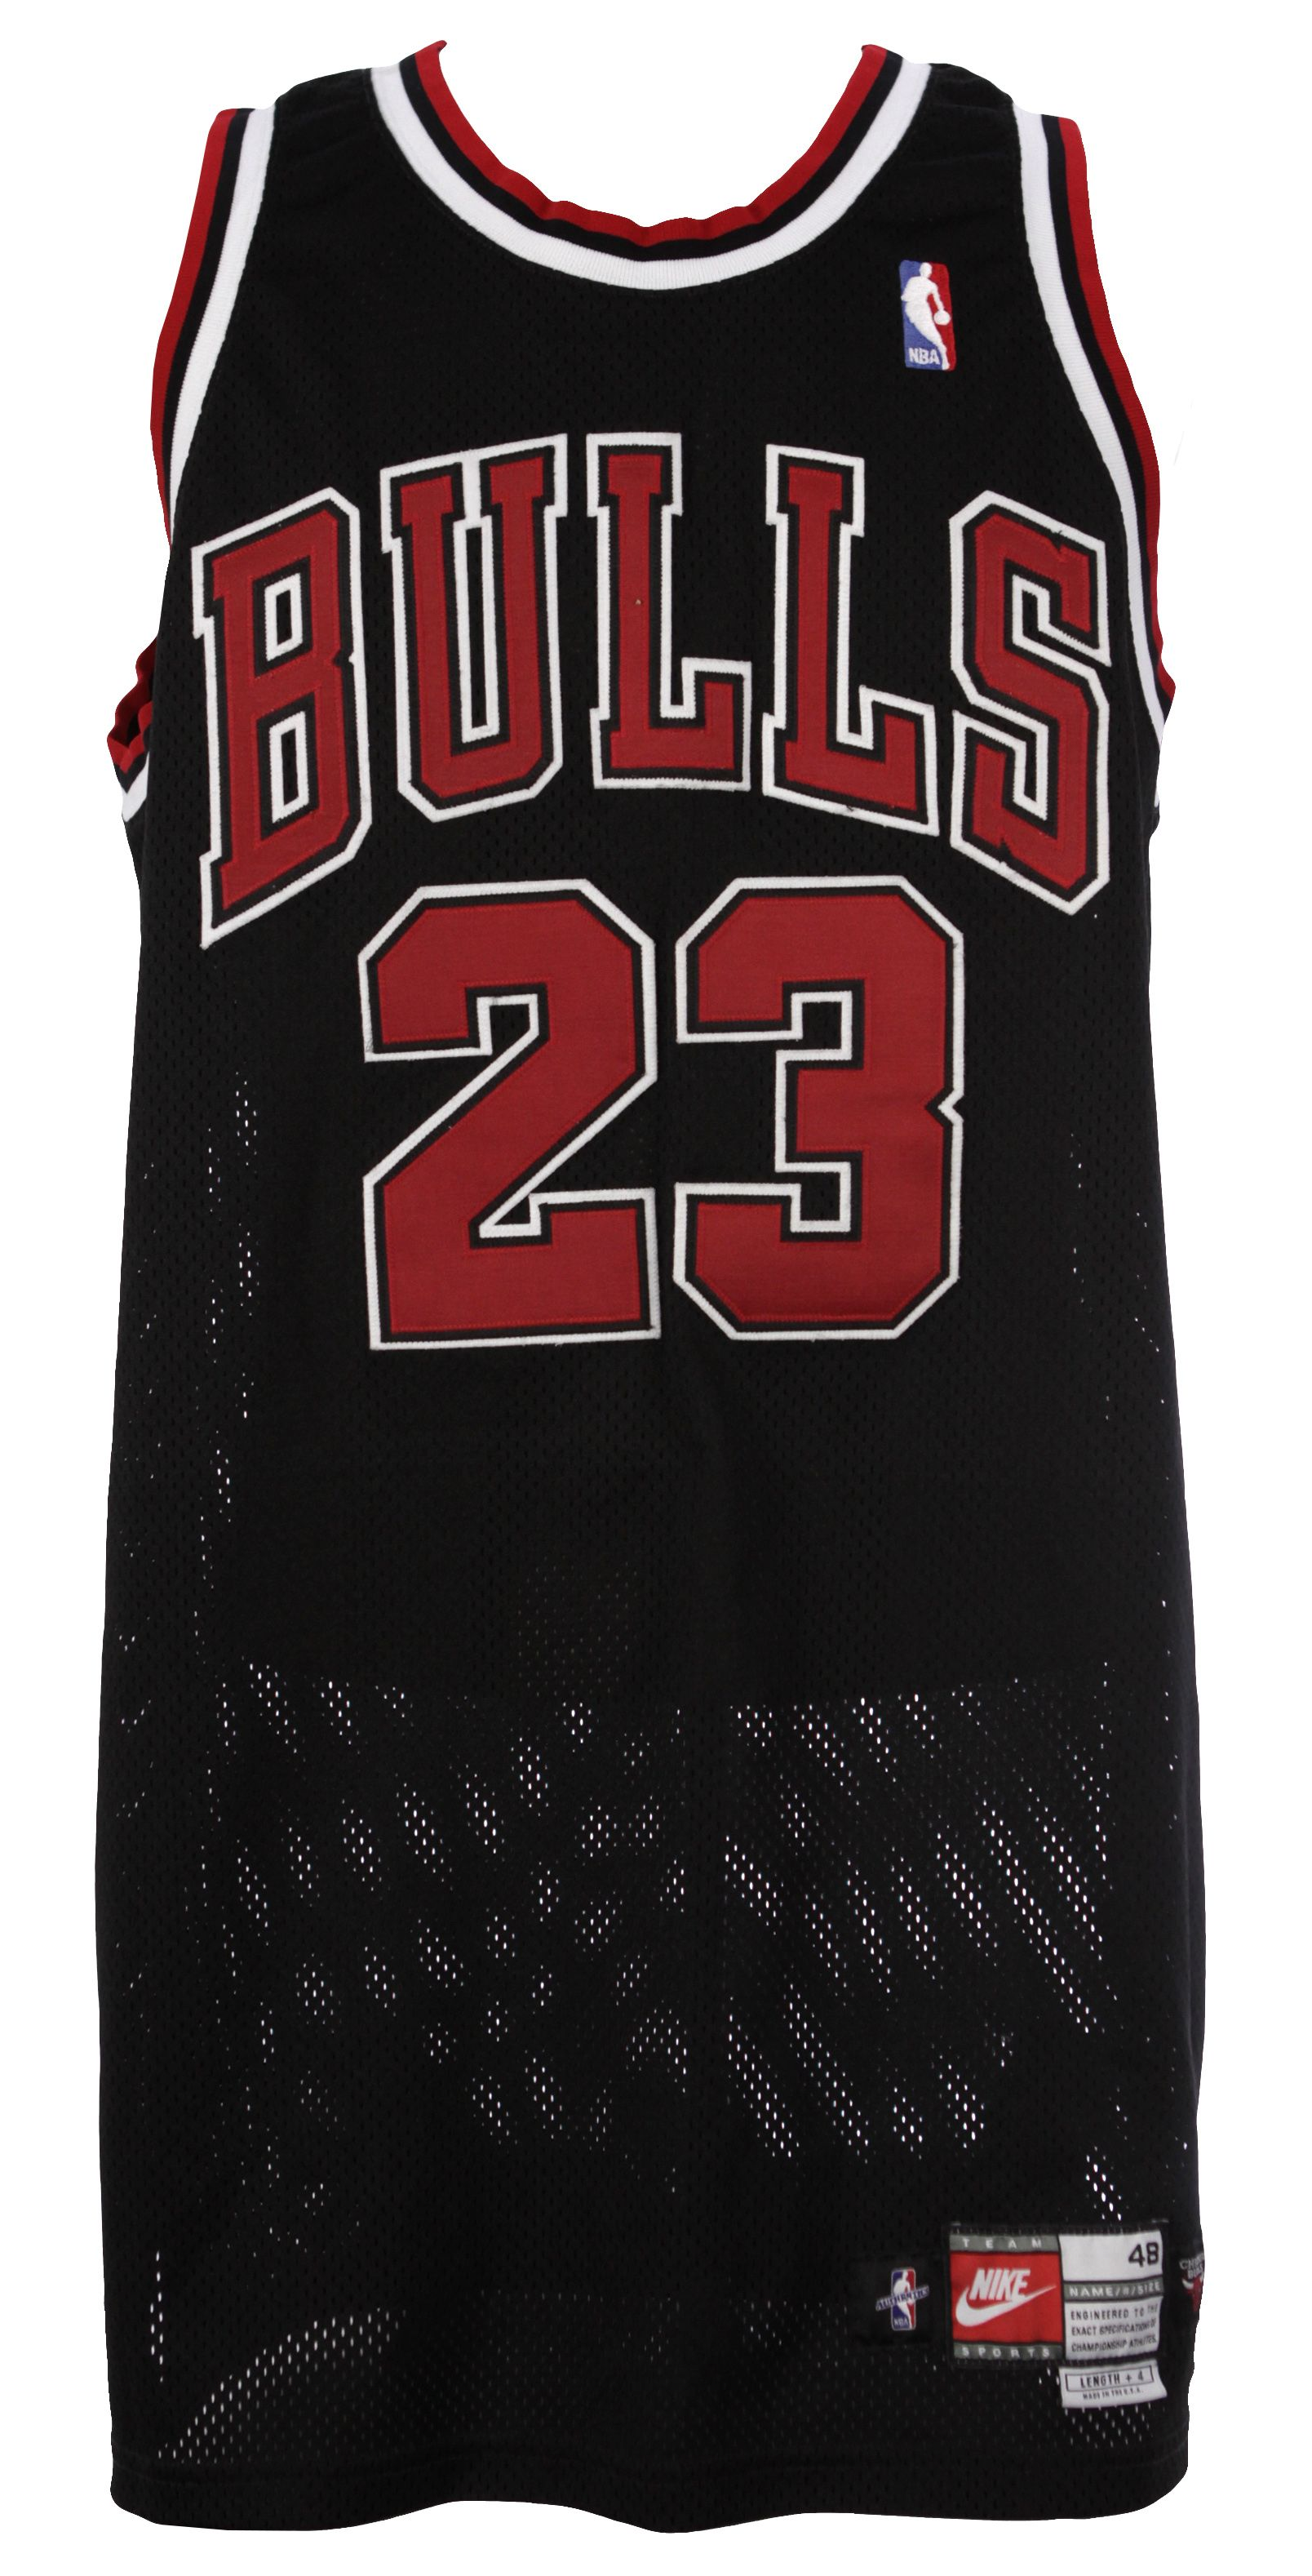 7dae156a725 Lot Detail - 1997-98 Michael Jordan Chicago Bulls Game Worn Alternate  Jersey (MEARS Auction LOA)